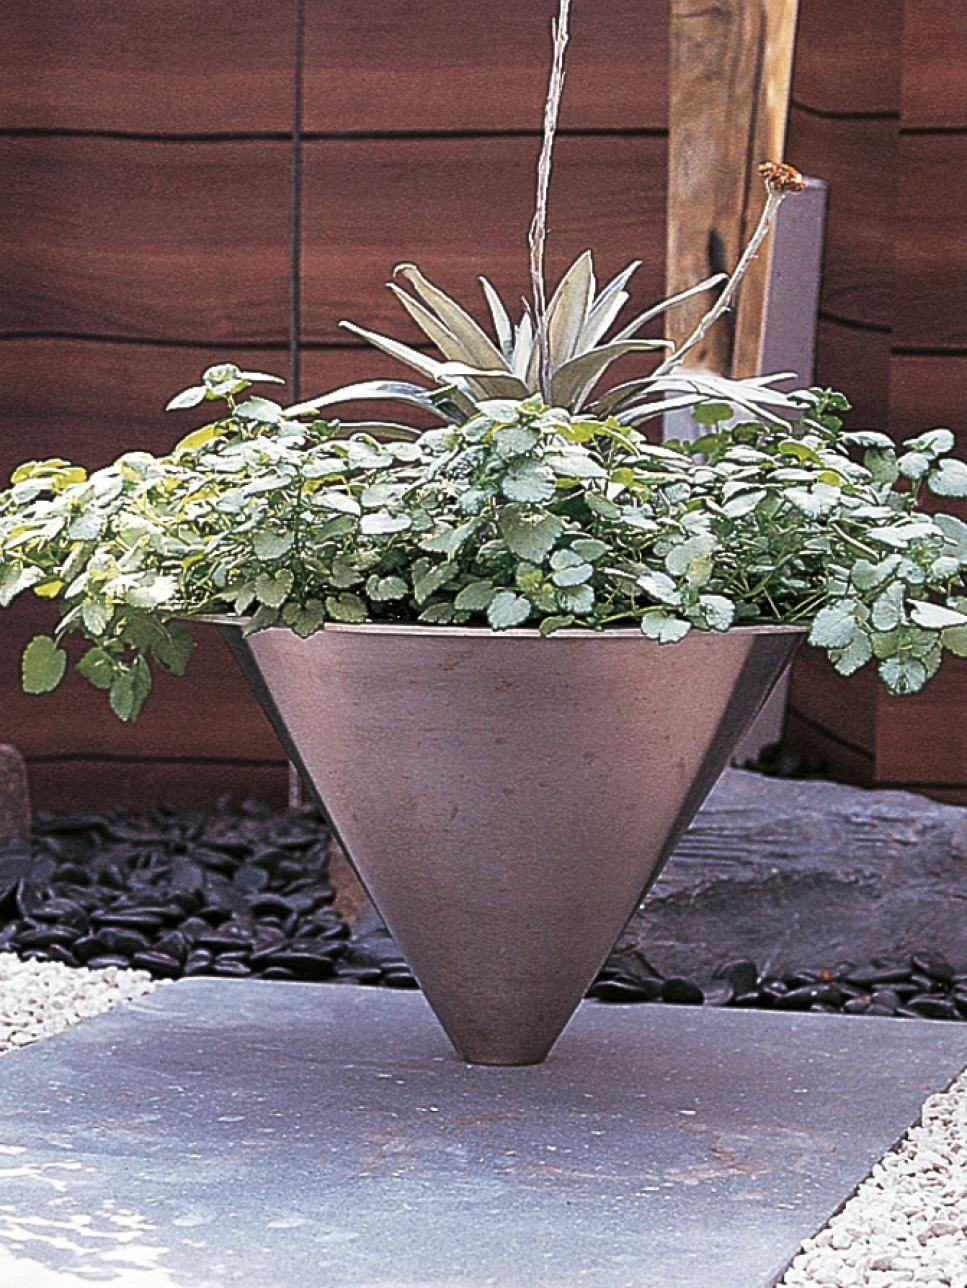 Container Garden Design Property choosing garden containers - container gardening ideas | gardens